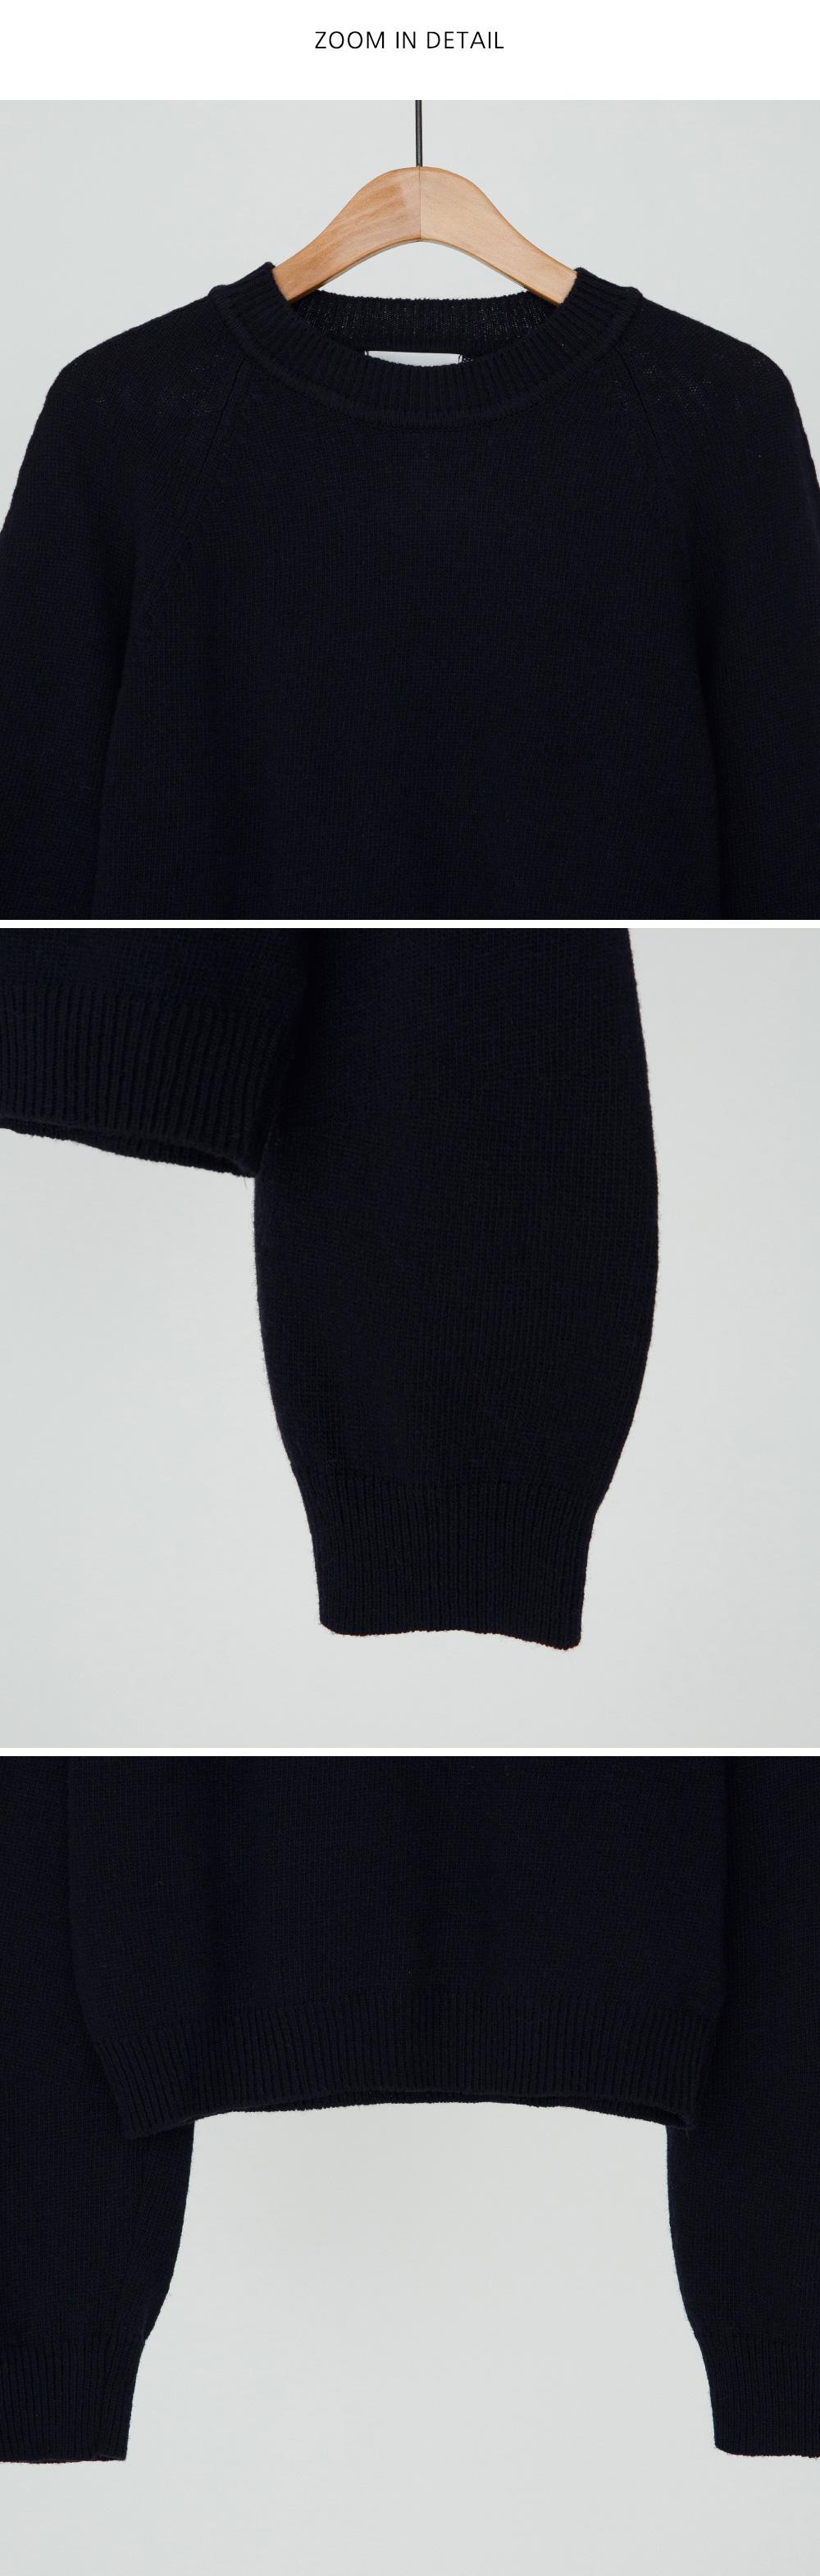 Nagrand Wool Crop Knit-knit